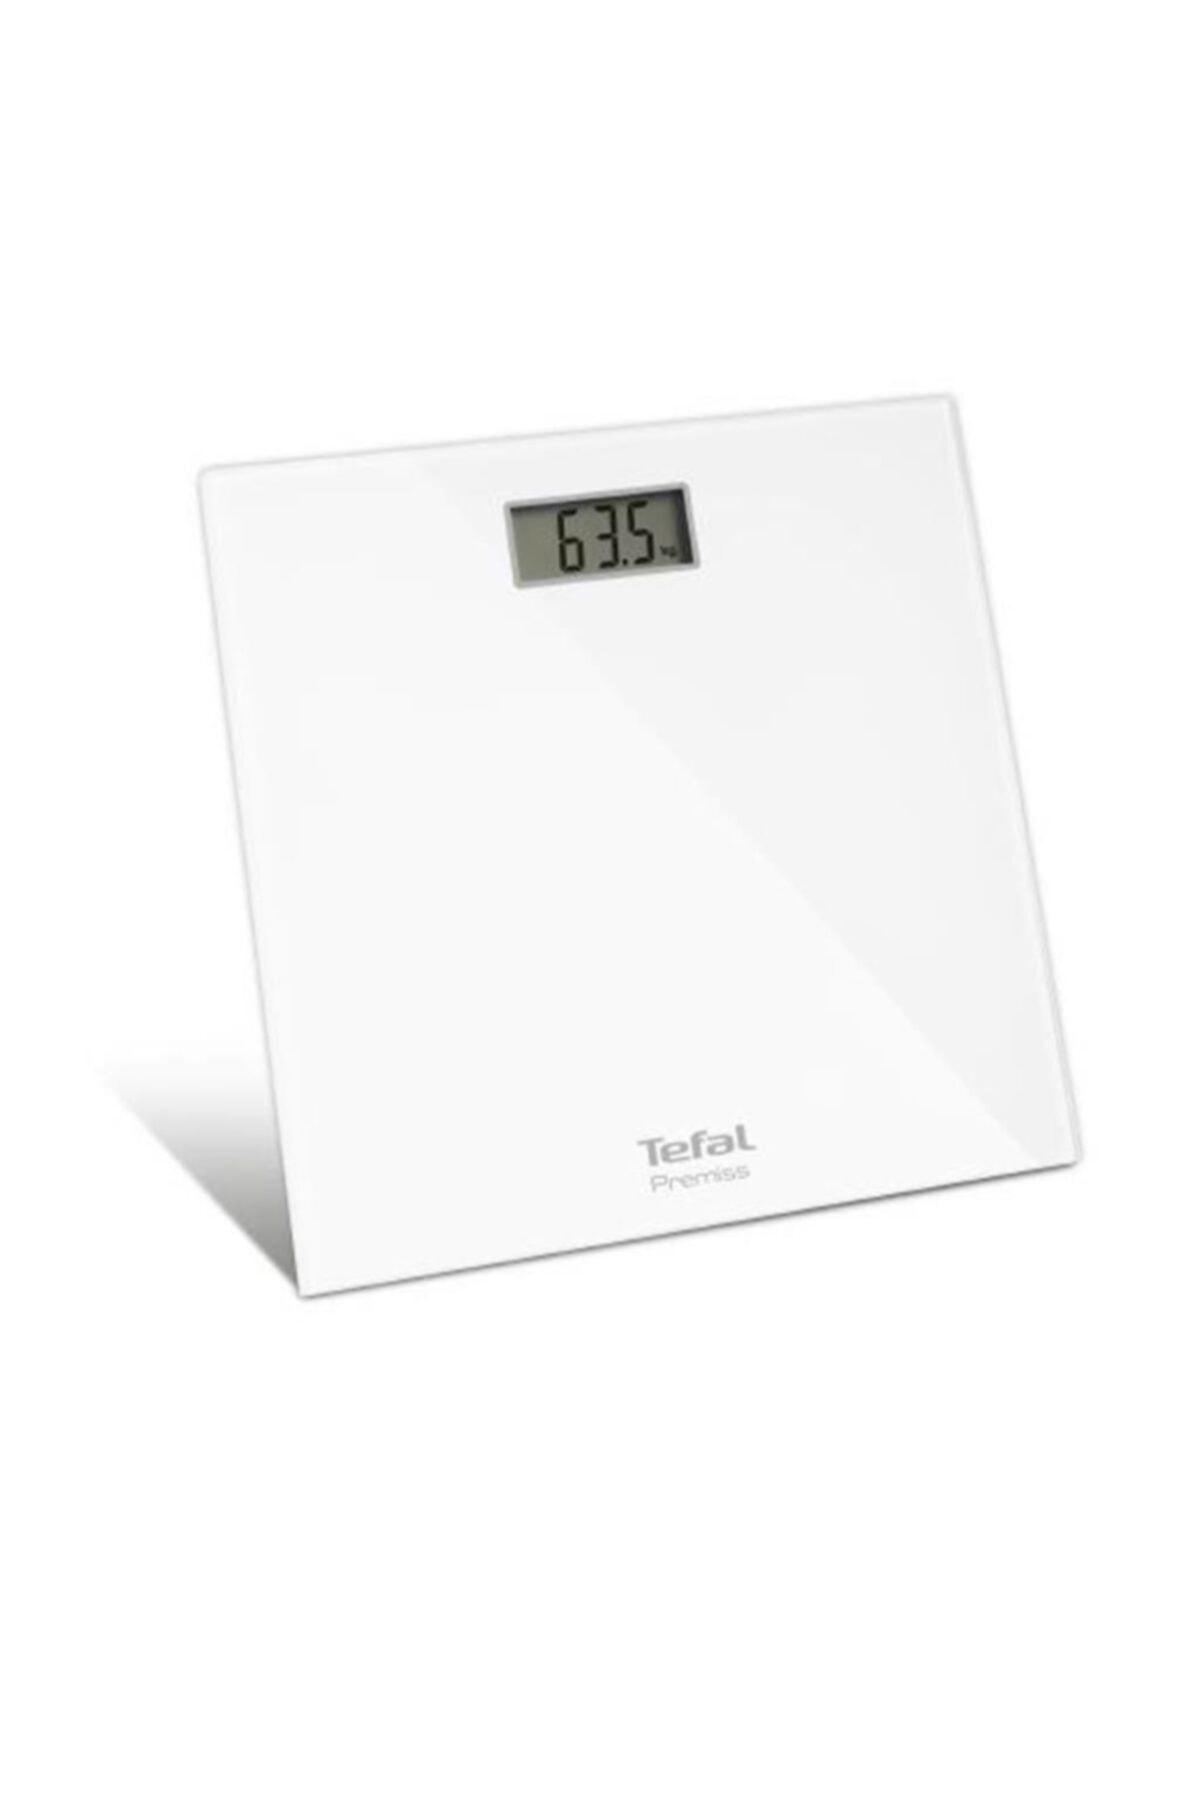 TEFAL Premiss Tartı Beyaz (2100098628) 1